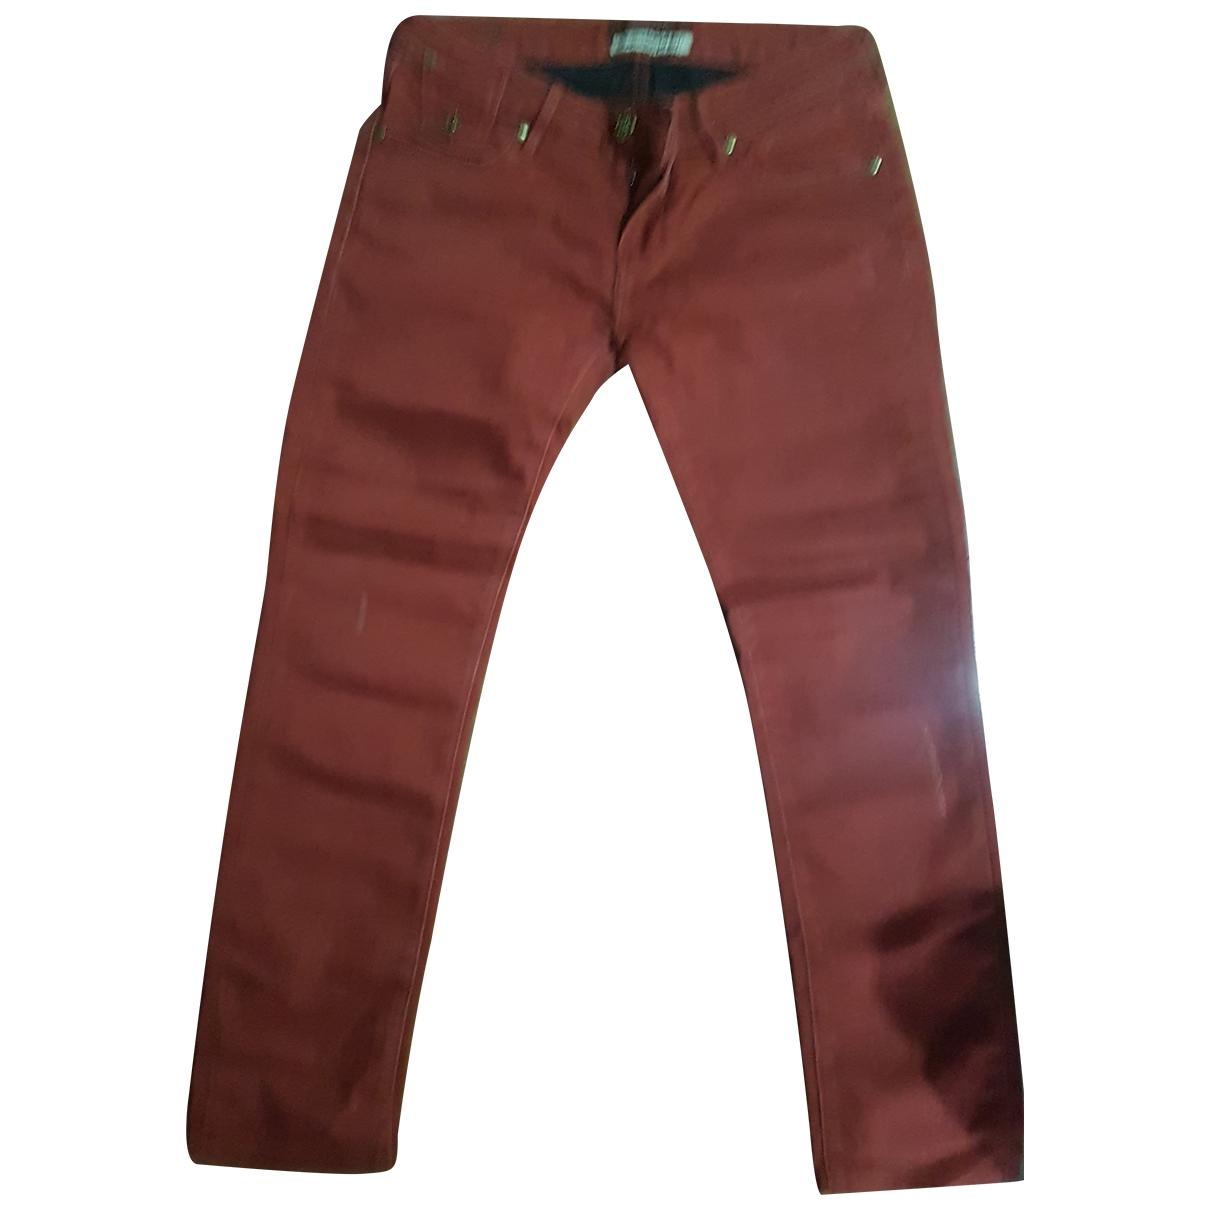 Maison Scotch \N Burgundy Cotton - elasthane Jeans for Women 27 US